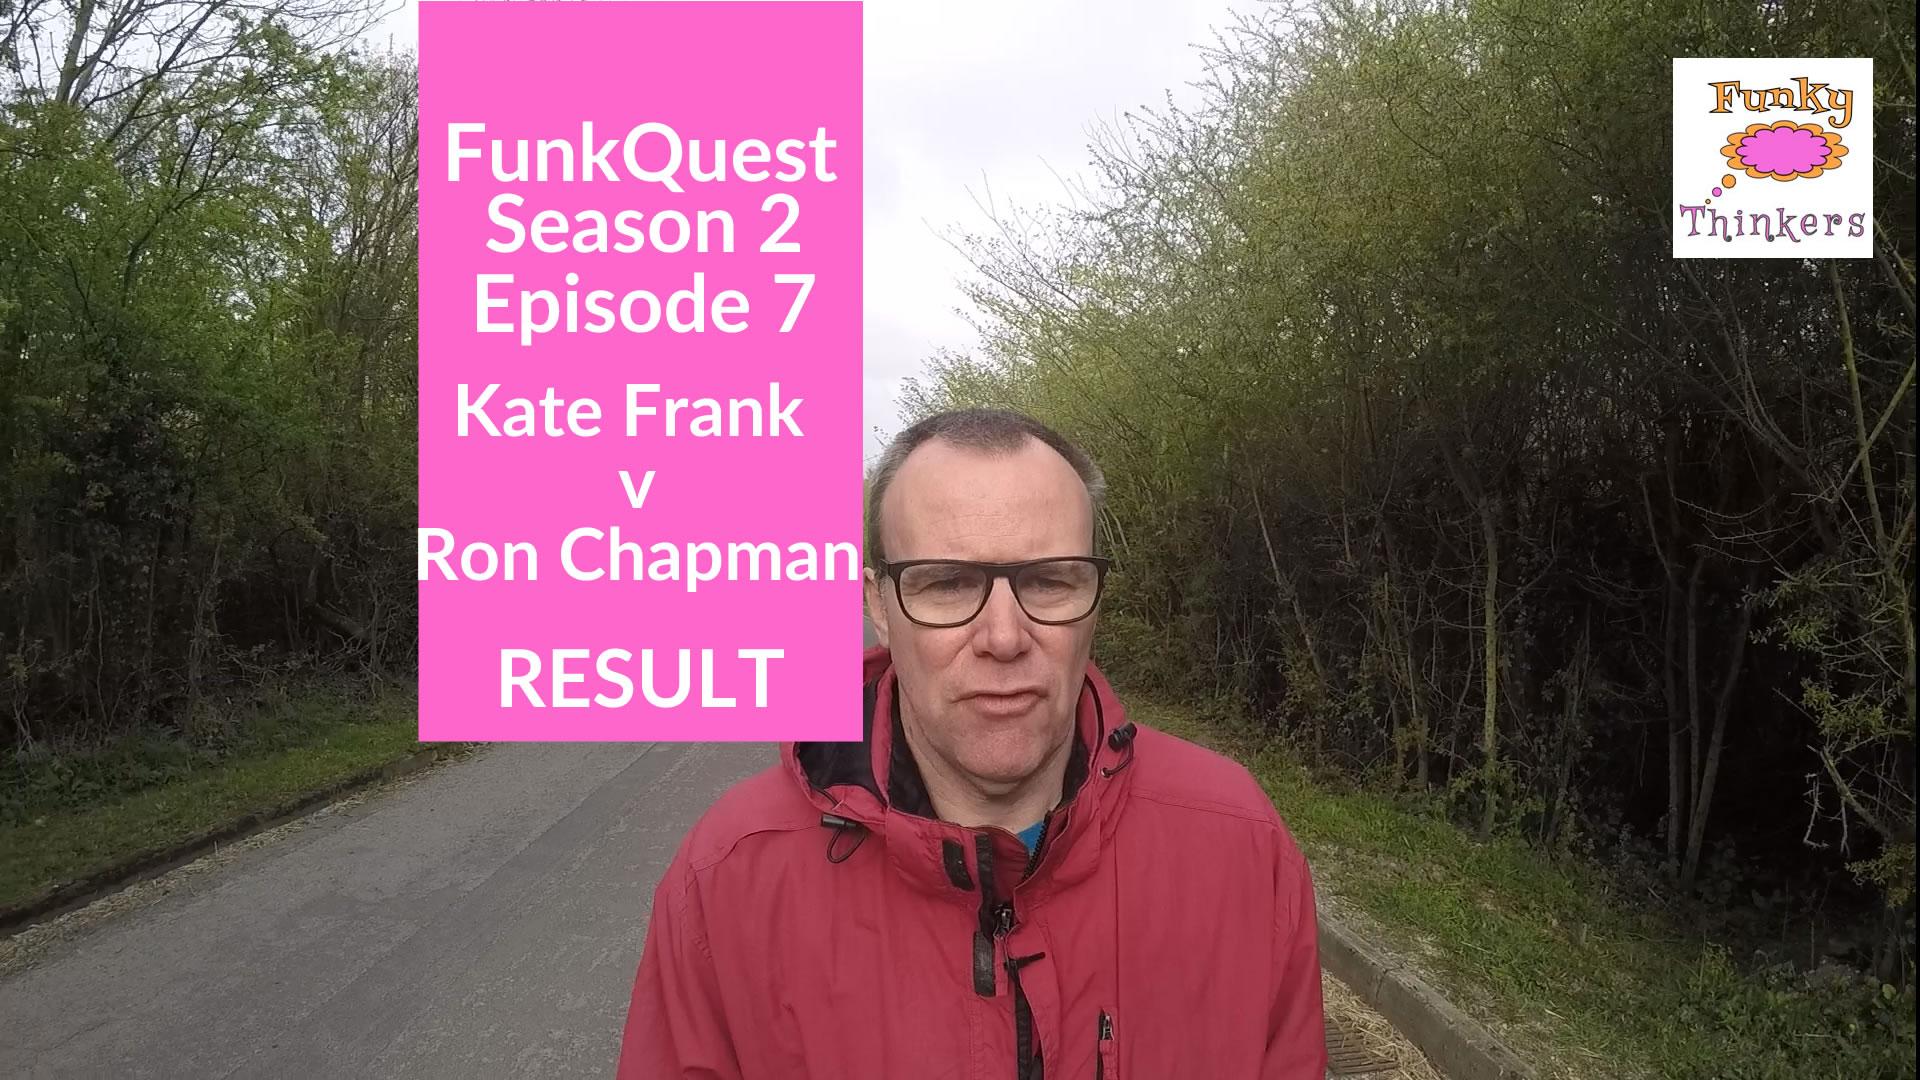 FunkQuest